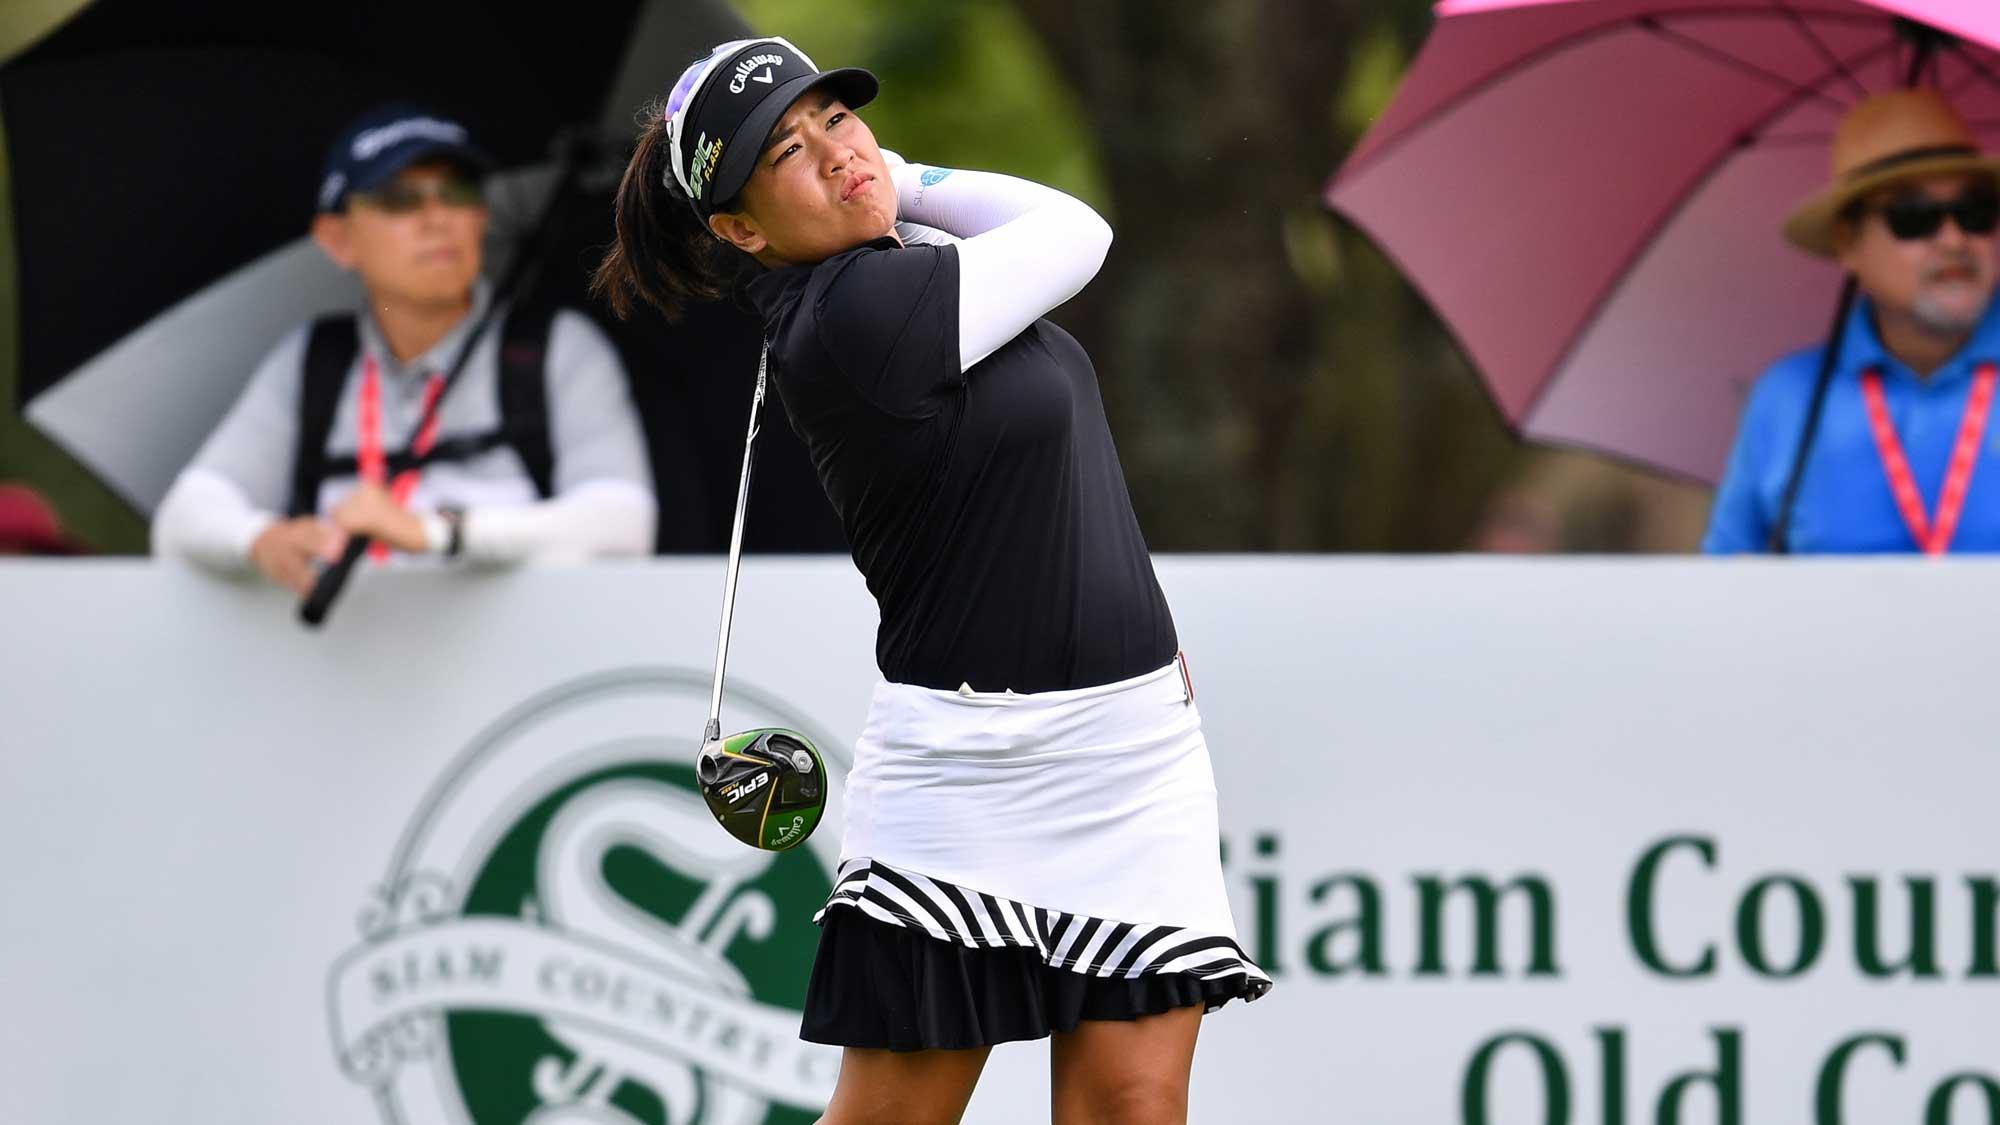 2019 A Jazzy New Look for Suwannapura | LPGA | Ladies Professional Golf Association